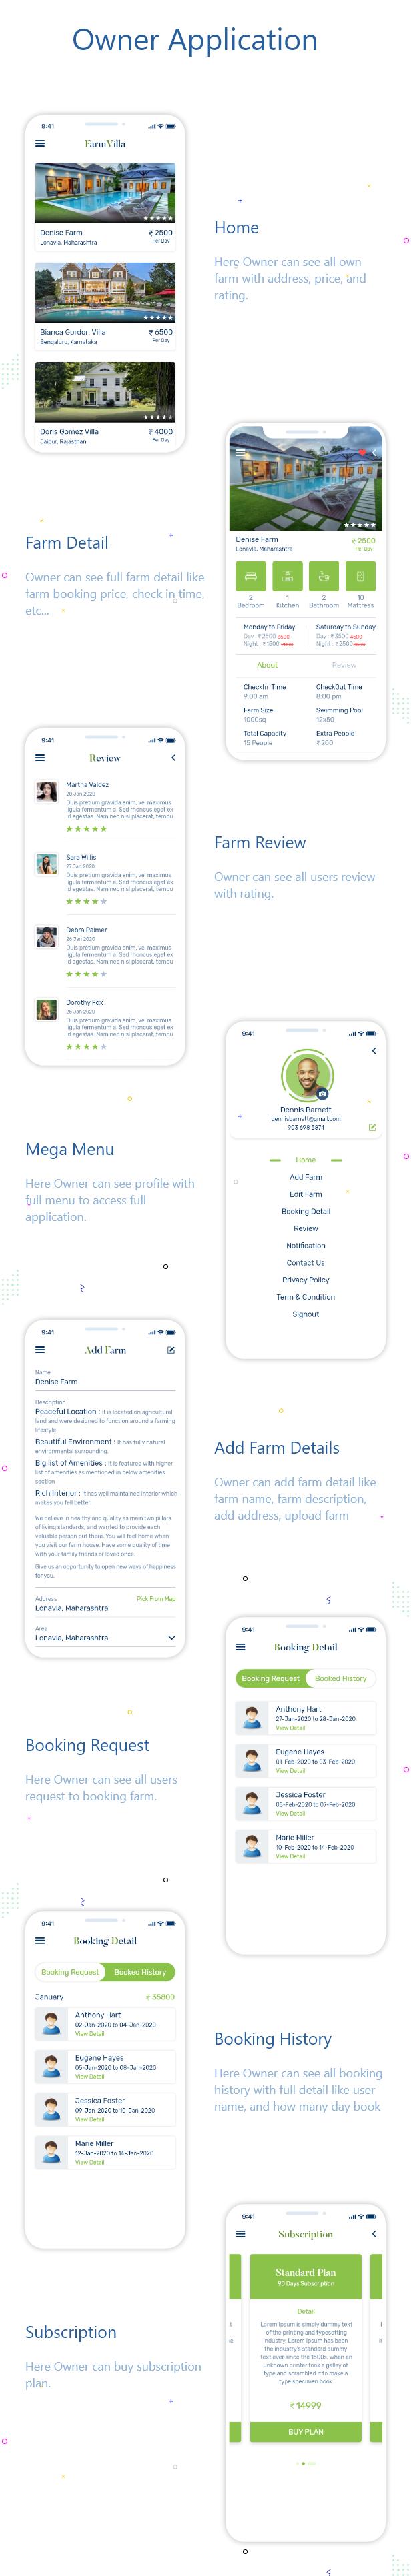 Farmvilla-Property-farmhouse-booking-app-and-admin-panel-marketplace-9